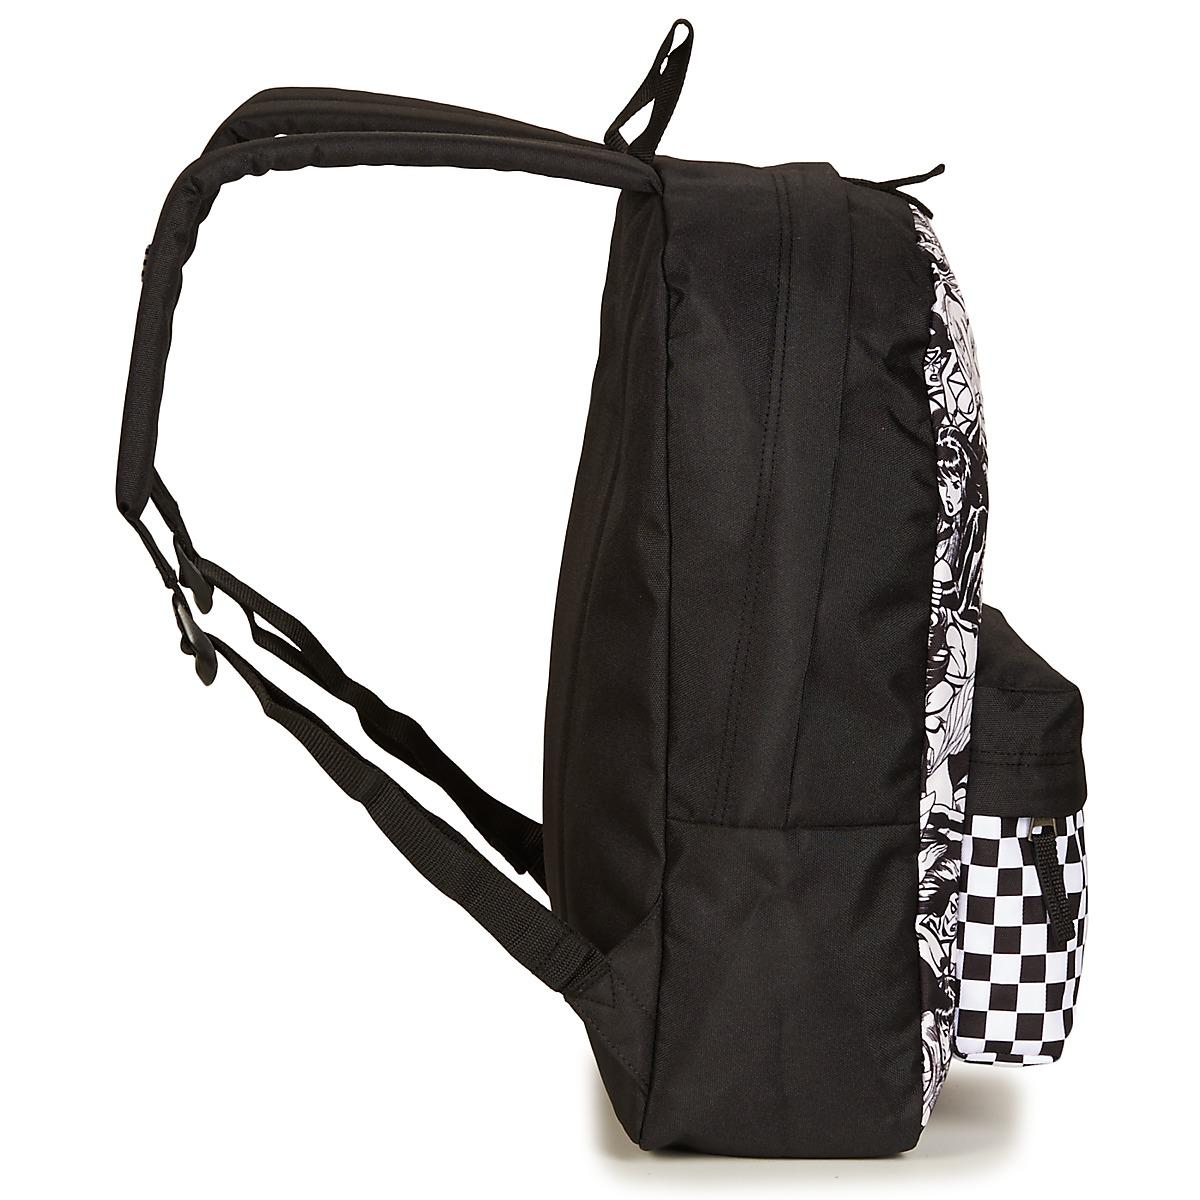 d2455d7006e066 Vans Marvel Women Realm Backpack Men s Backpack In Black in Black ...